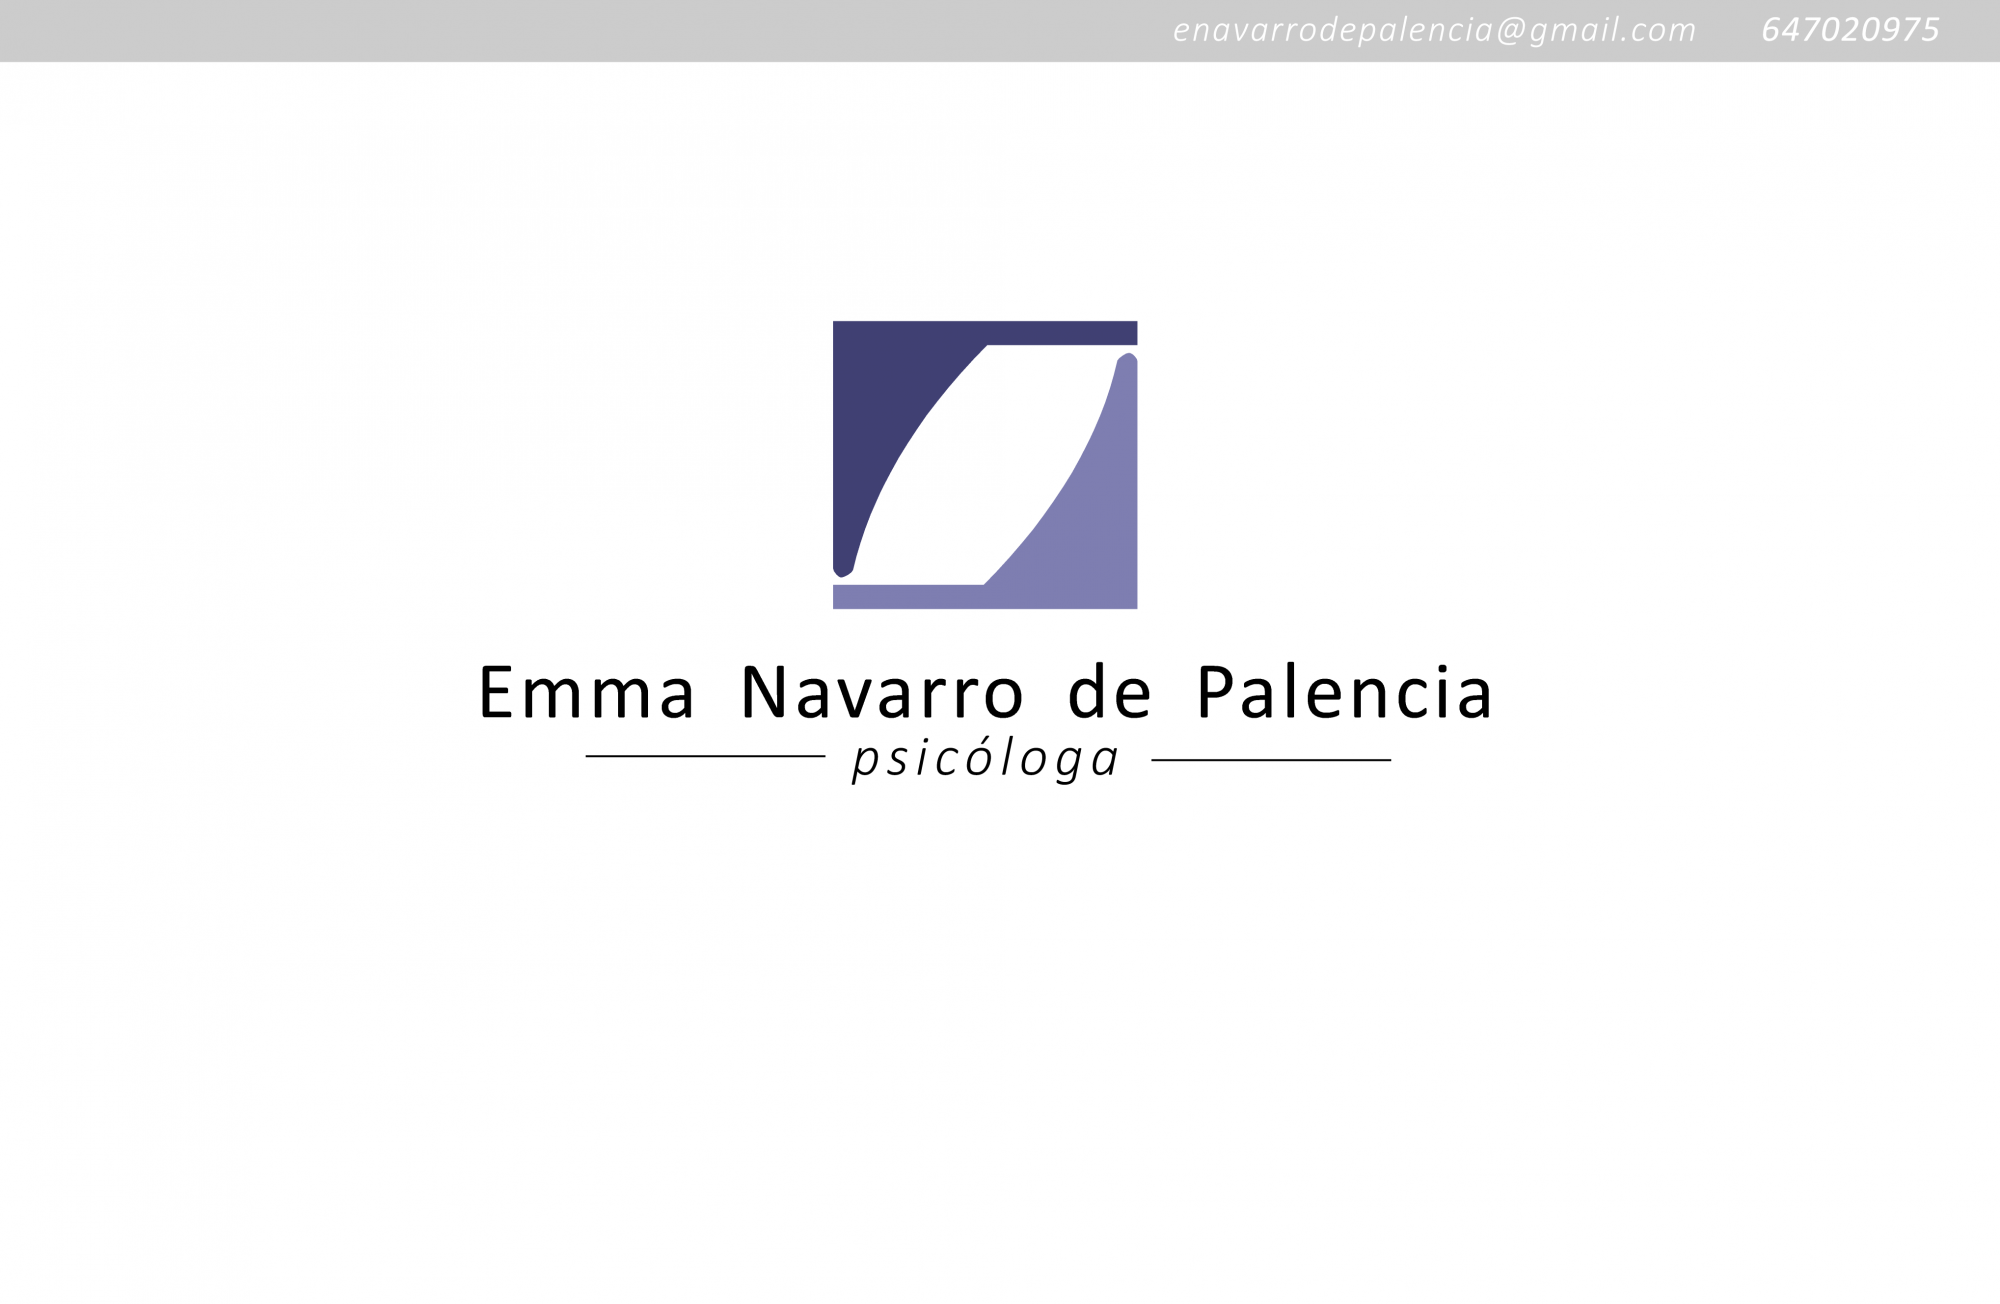 Psicóloga Emma Navarro de Palencia